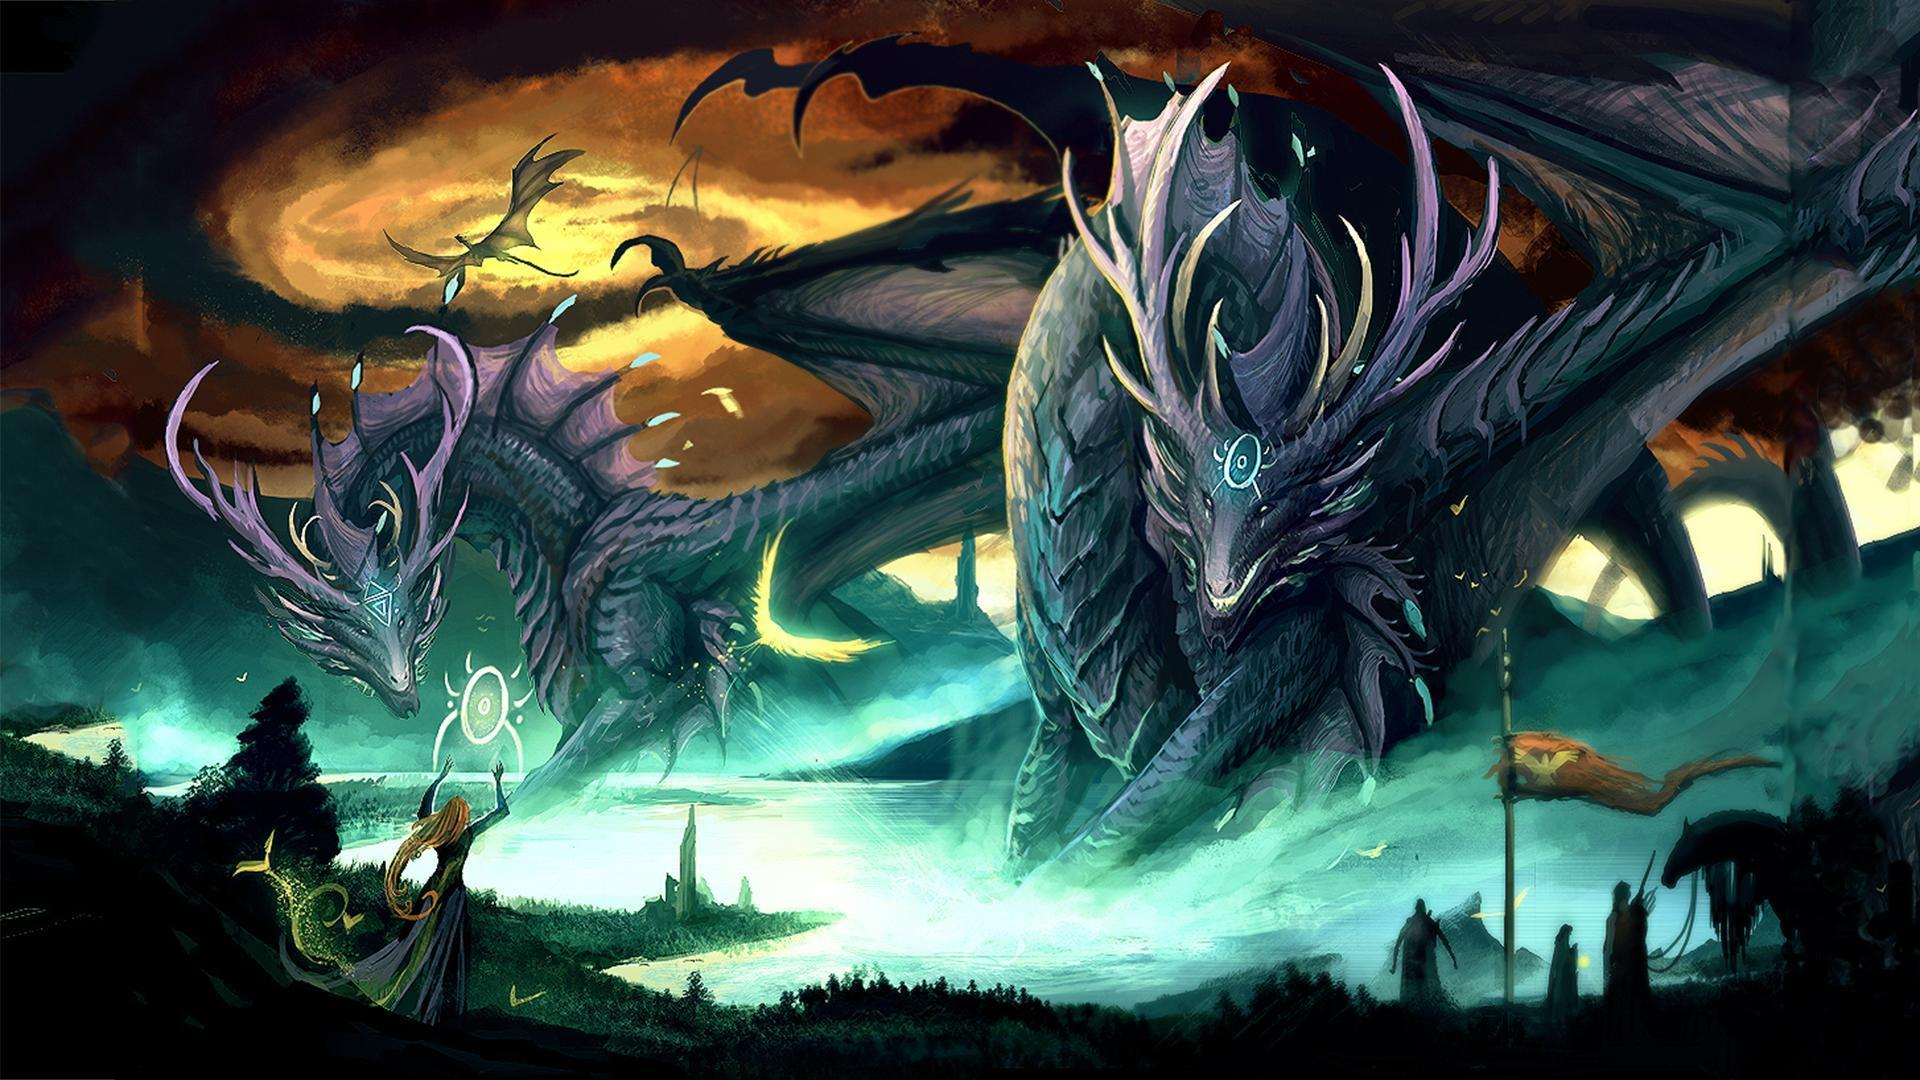 dragon wallpaper widescreen high resolution - photo #7